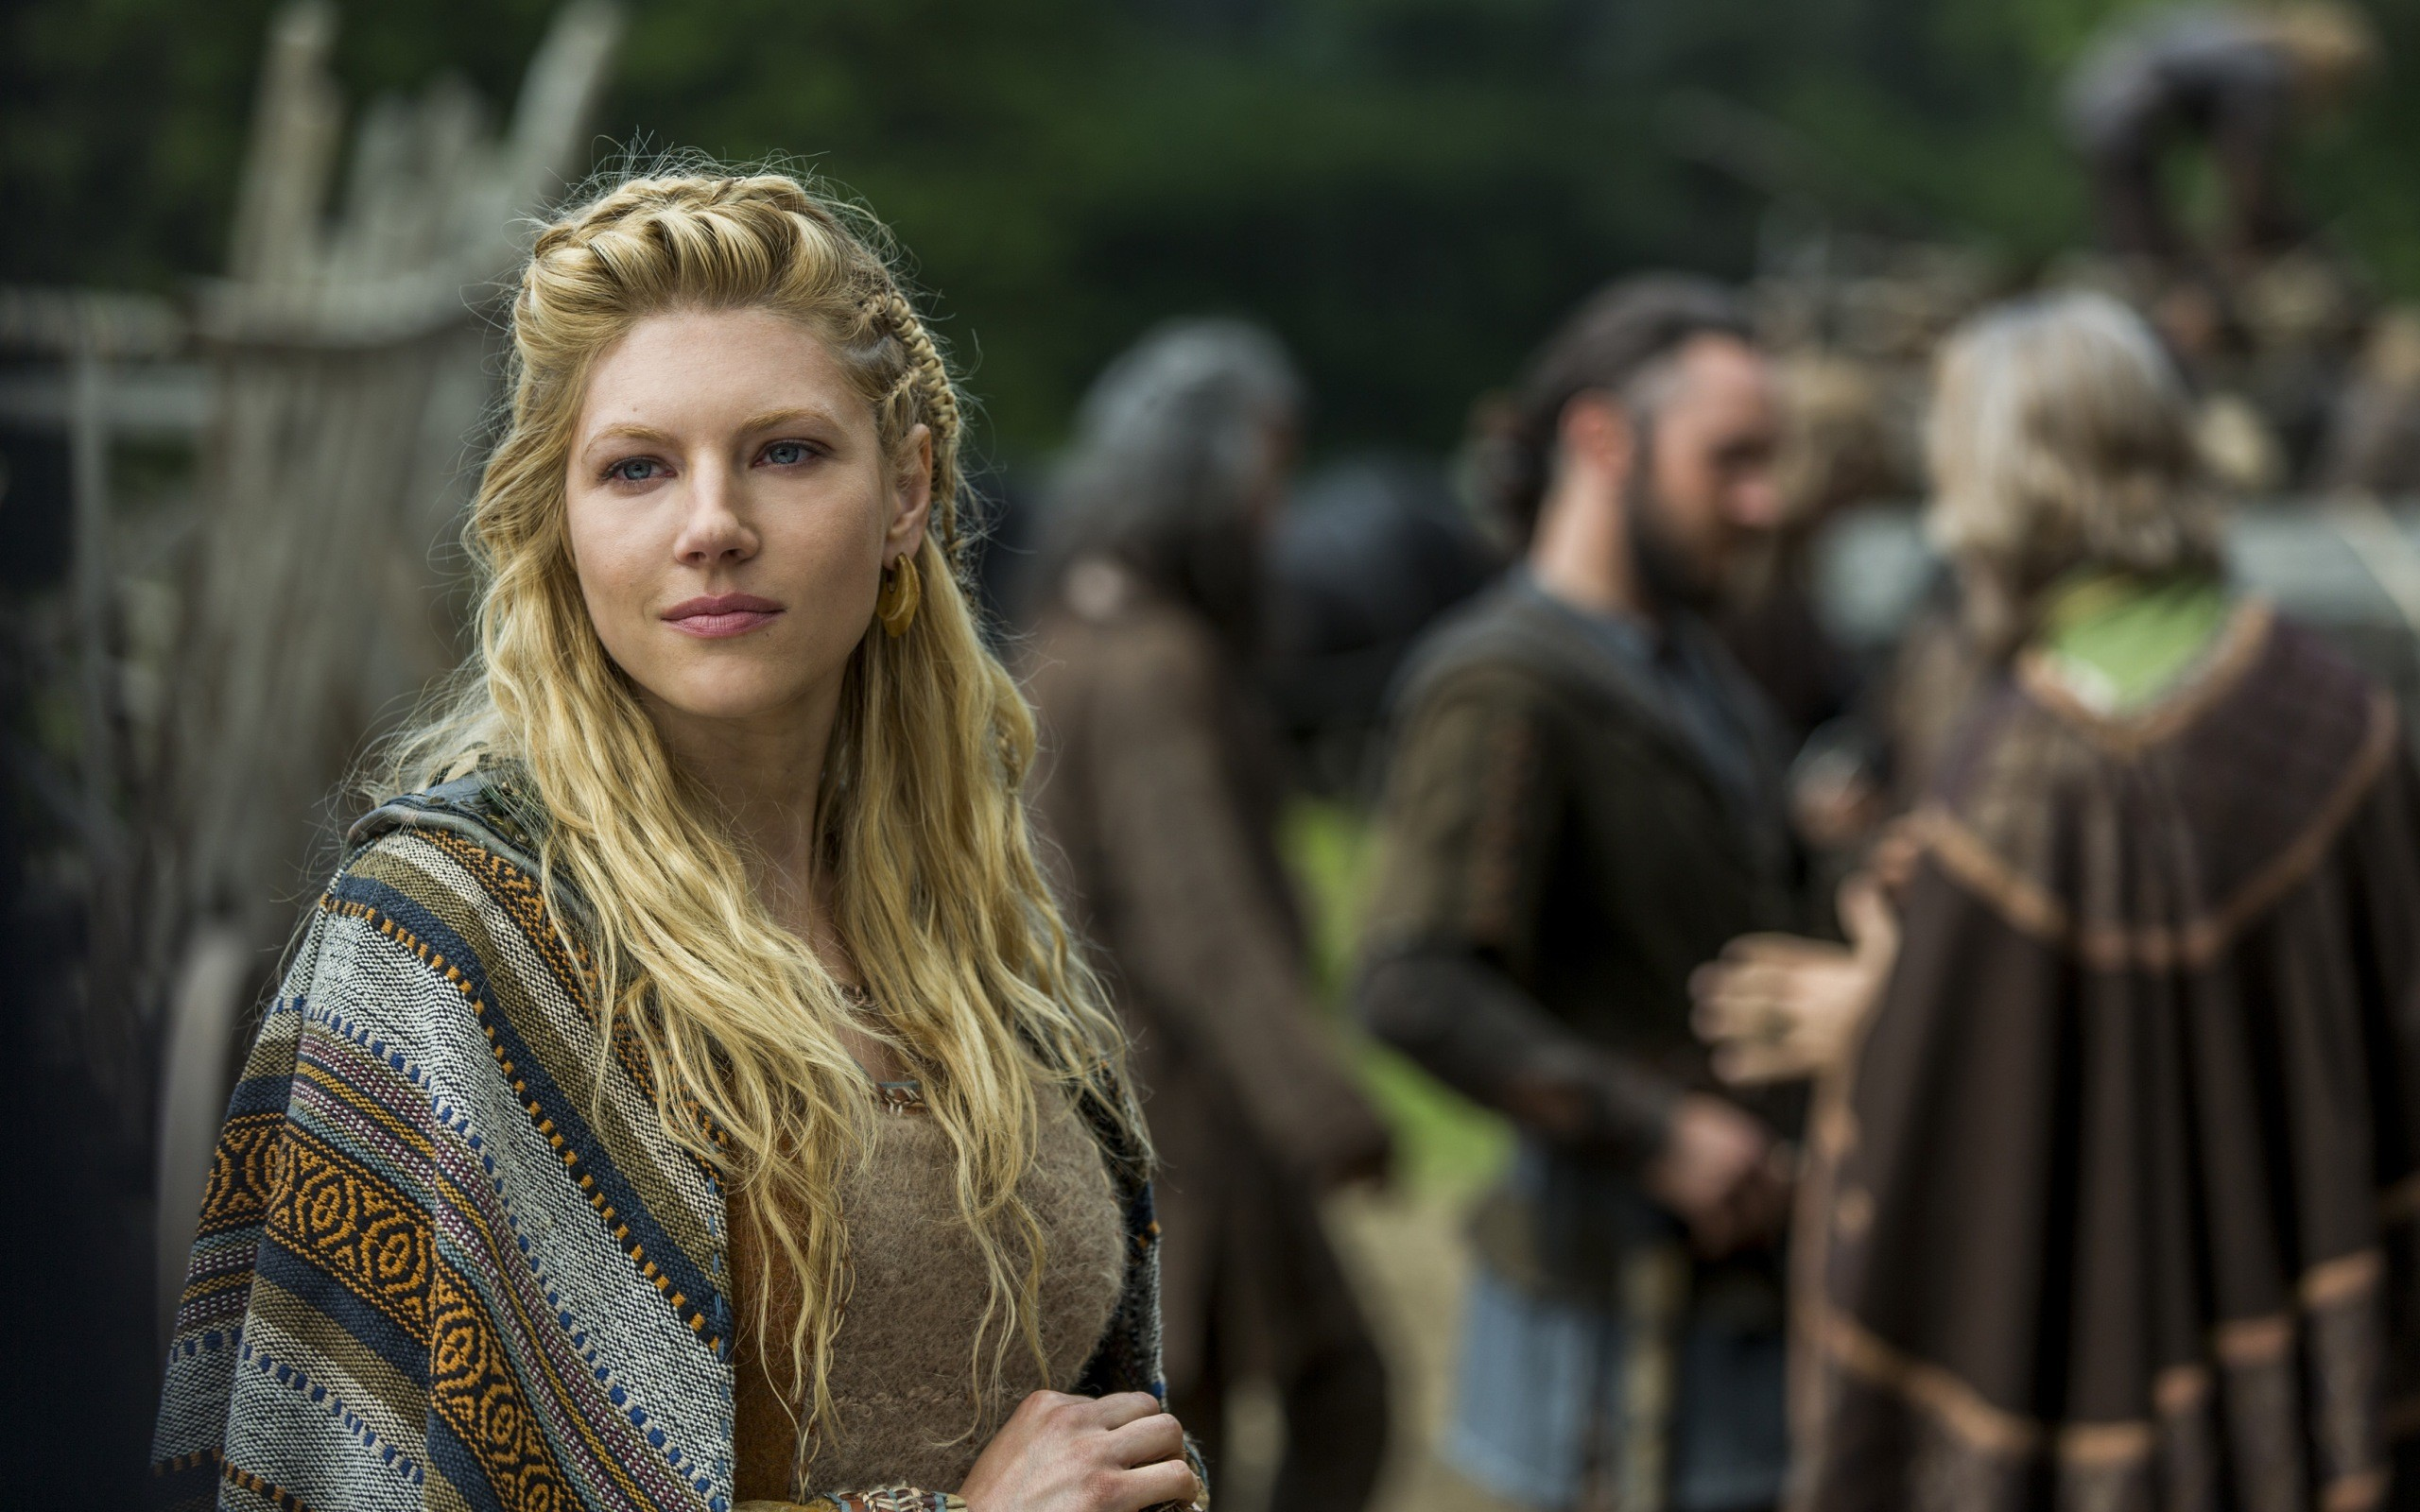 Free Download Vikings Wallpaper HD.